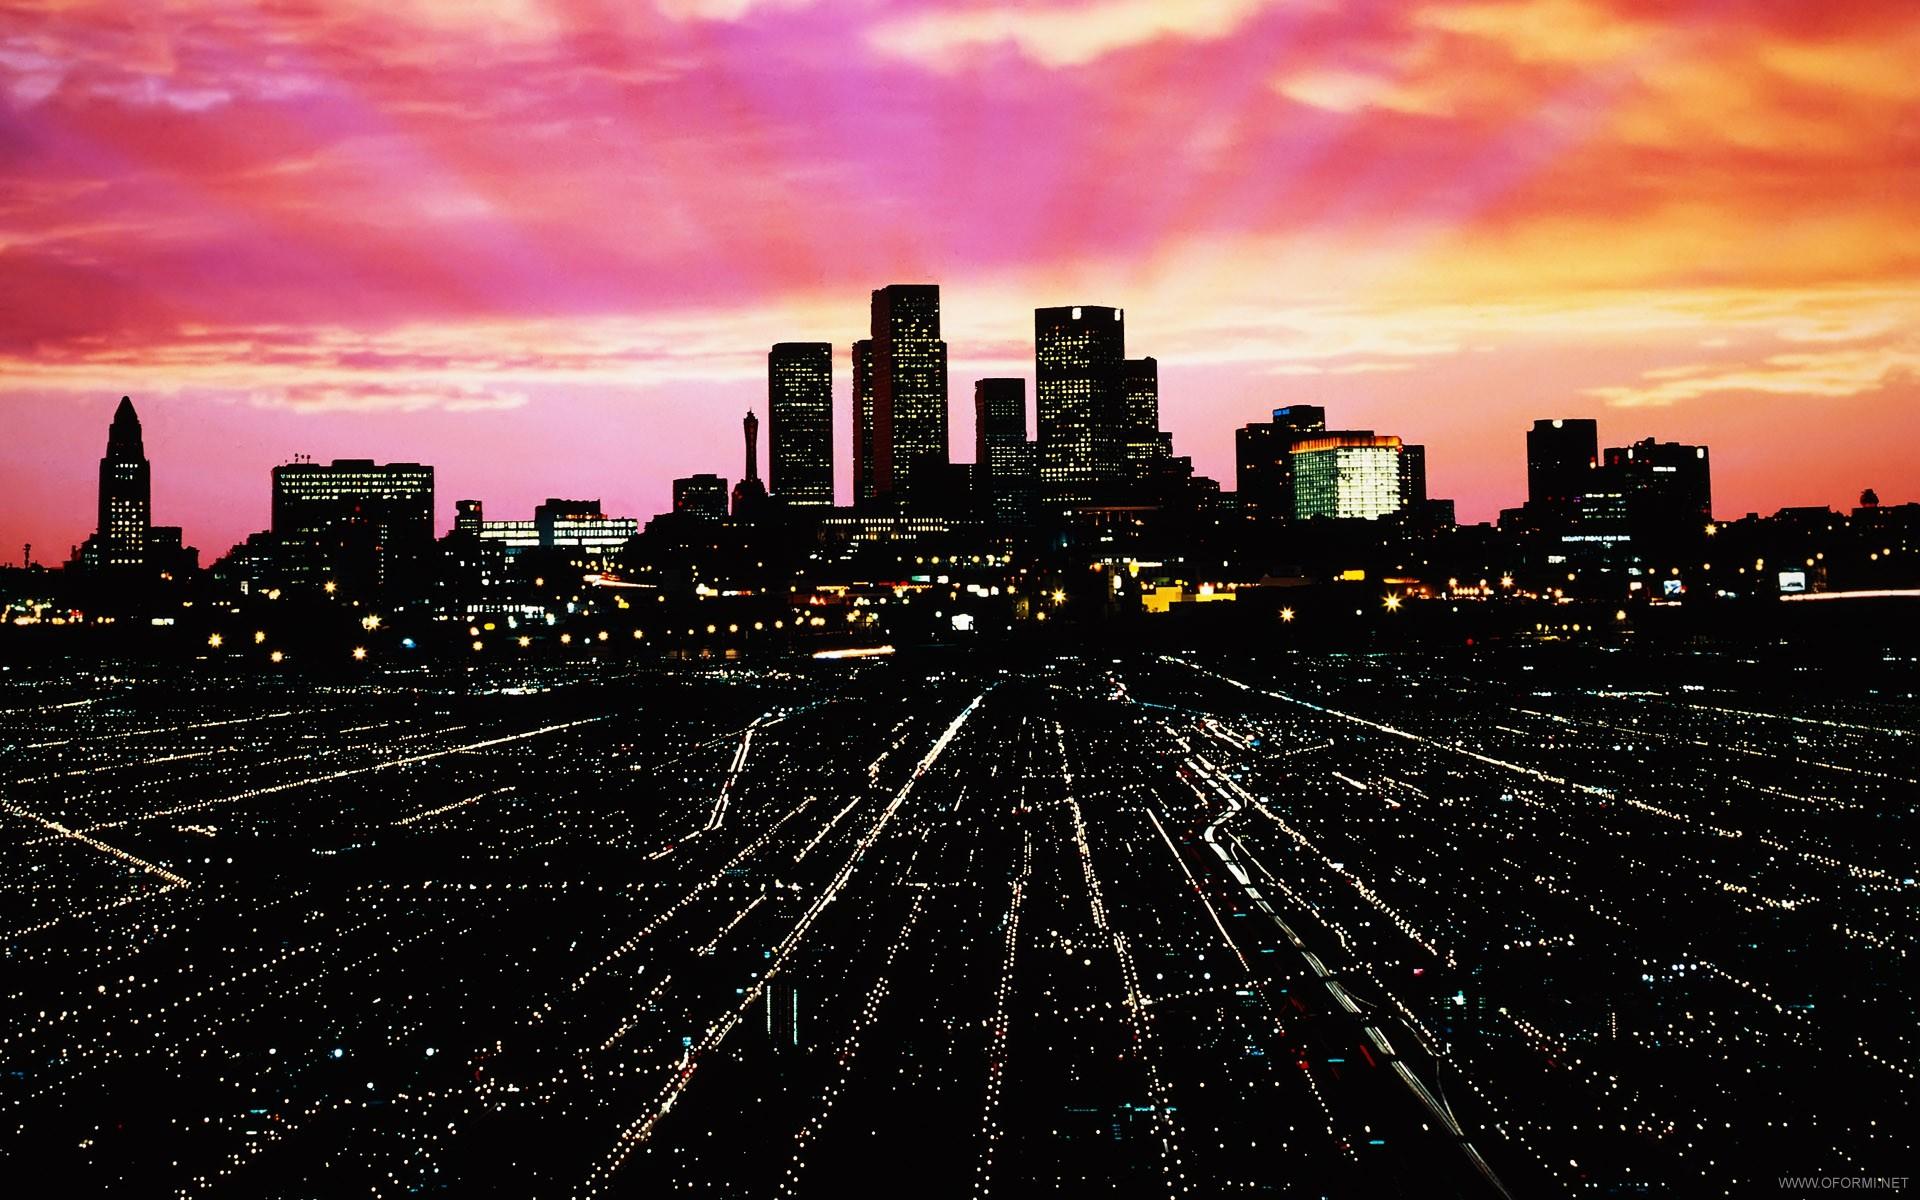 popular urban destinati time - HD1920×1080